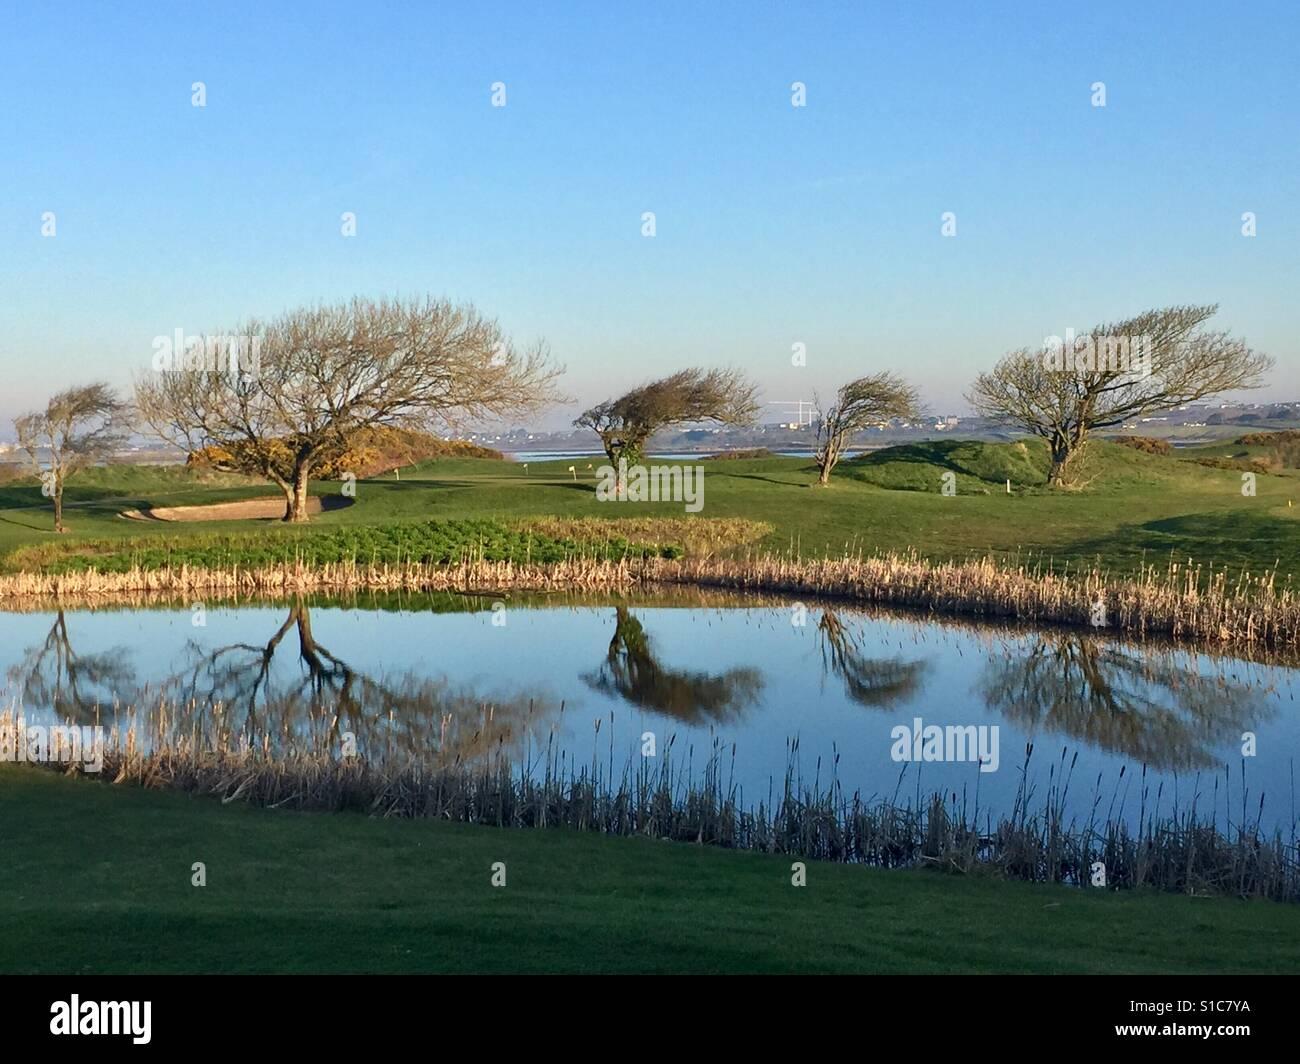 Reflecting on Windblown Trees, Ireland - Stock Image